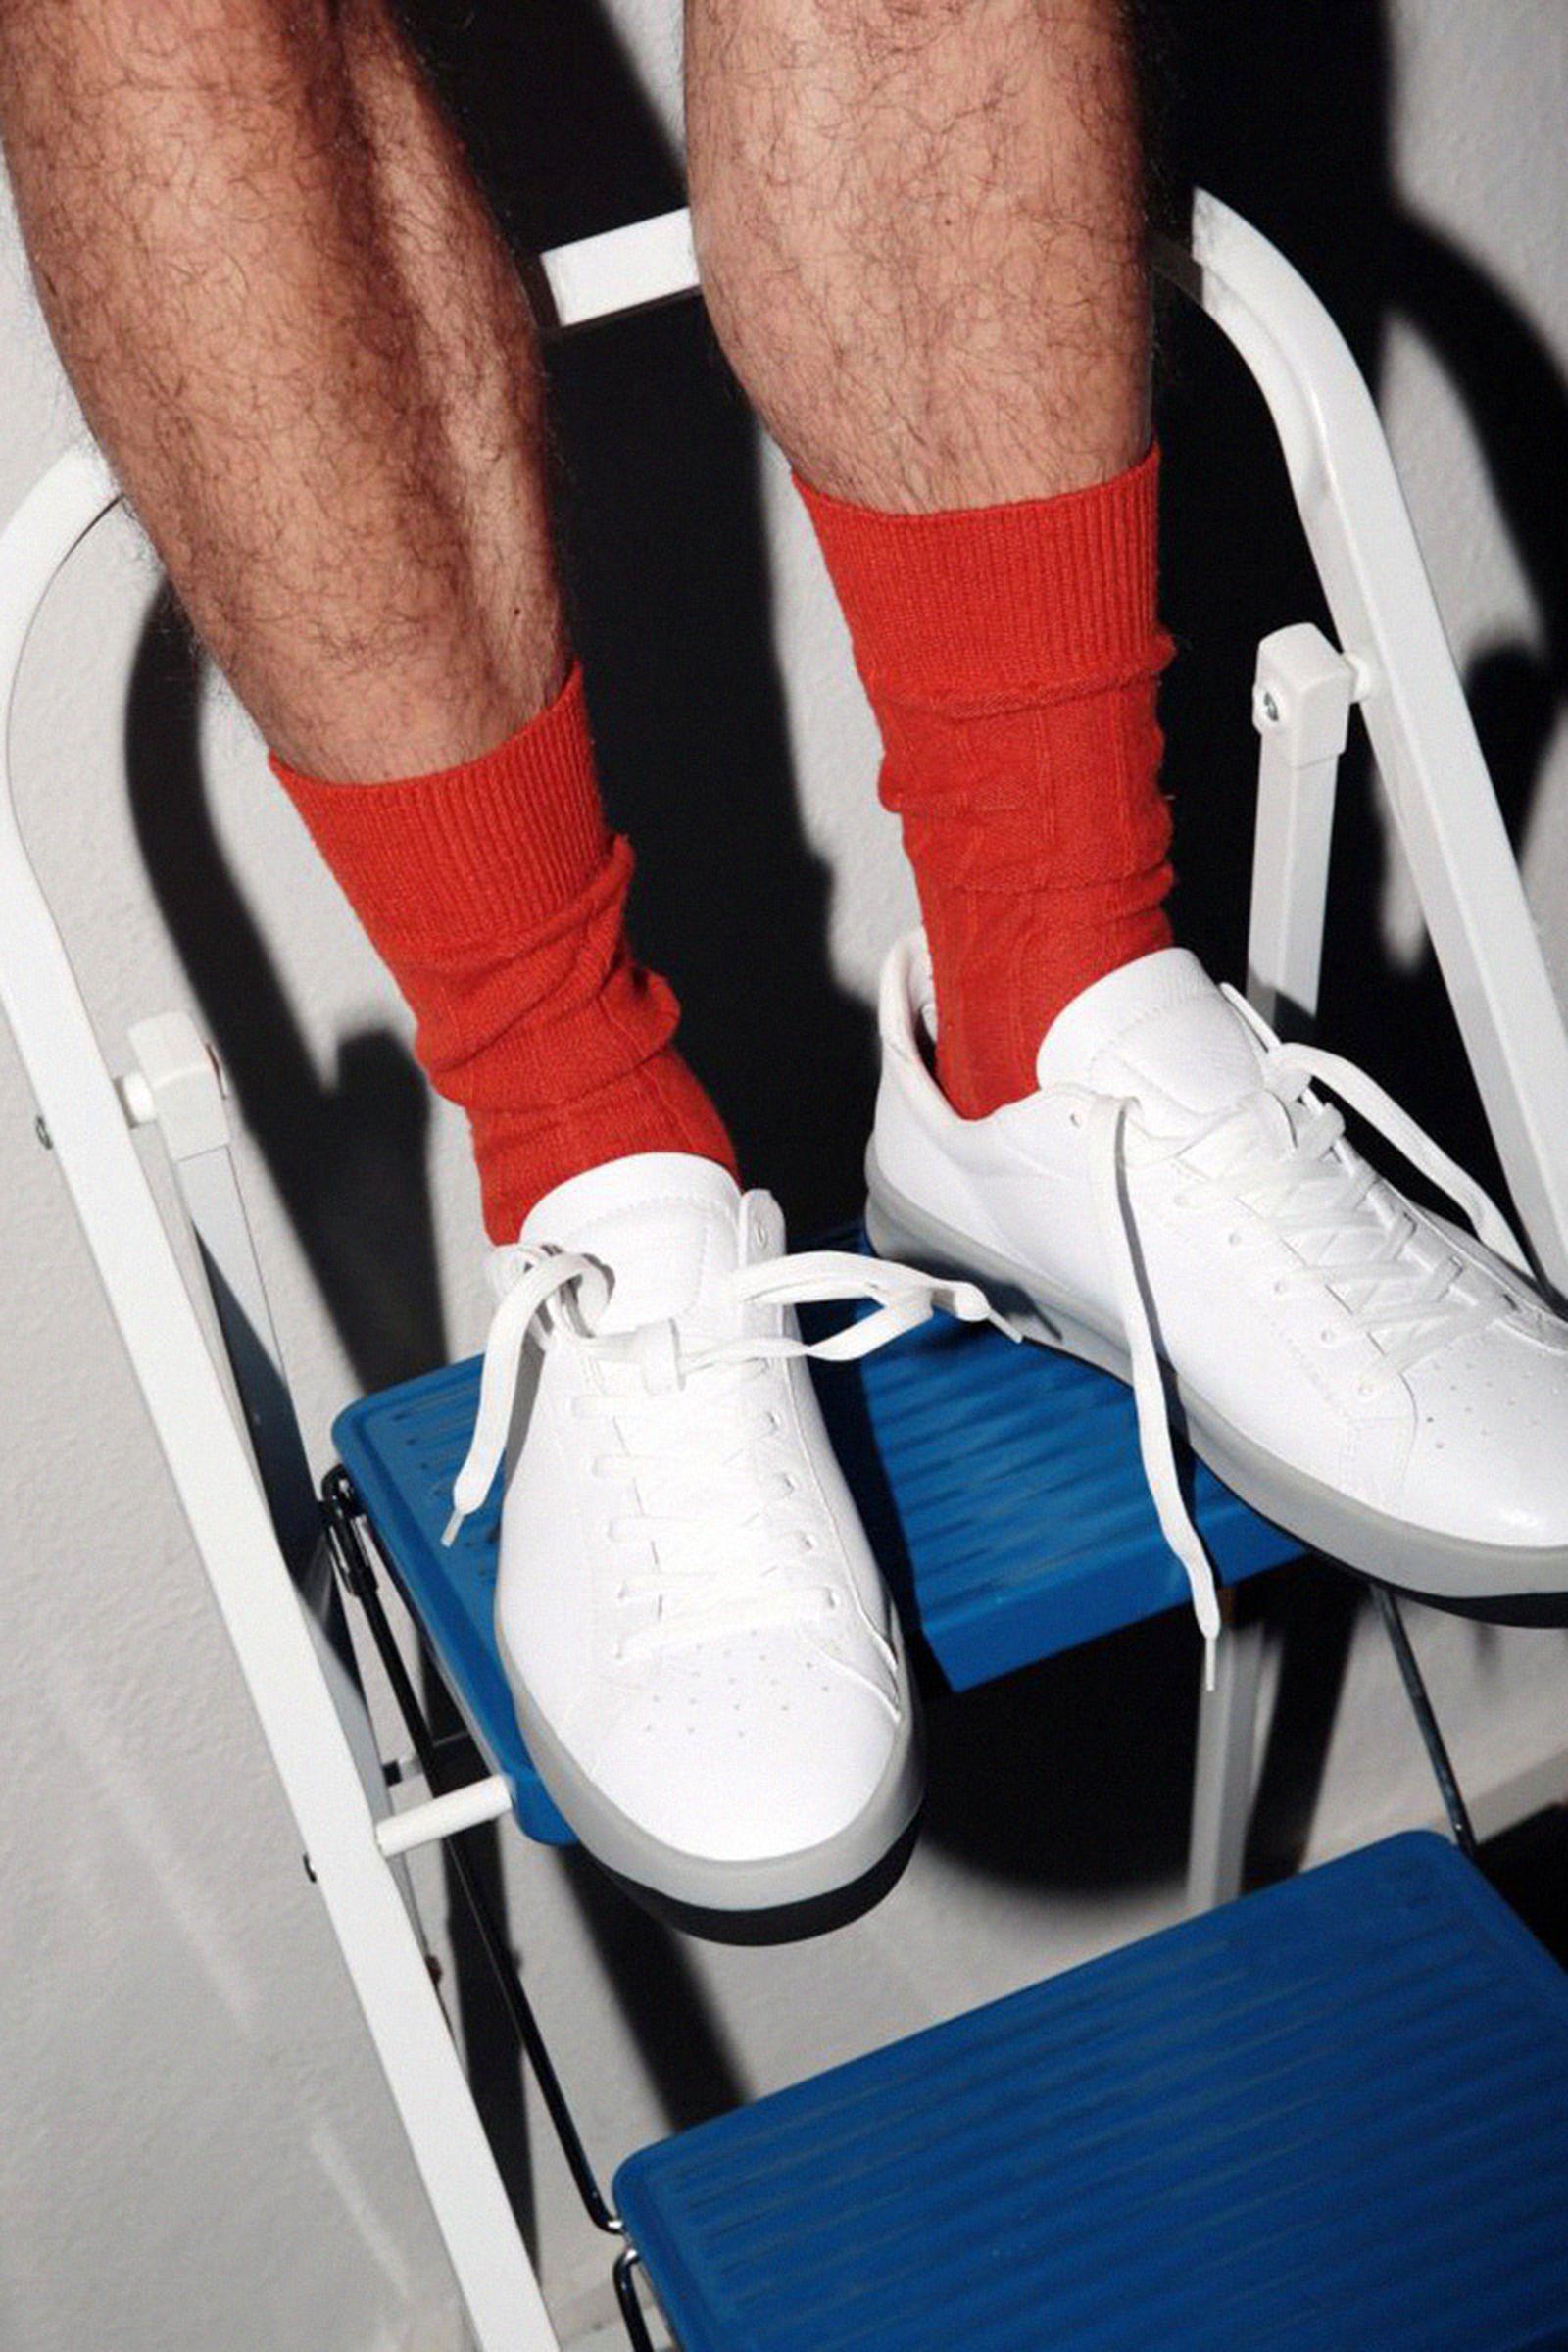 german clothing brands vor 023c Adidas Boulezar